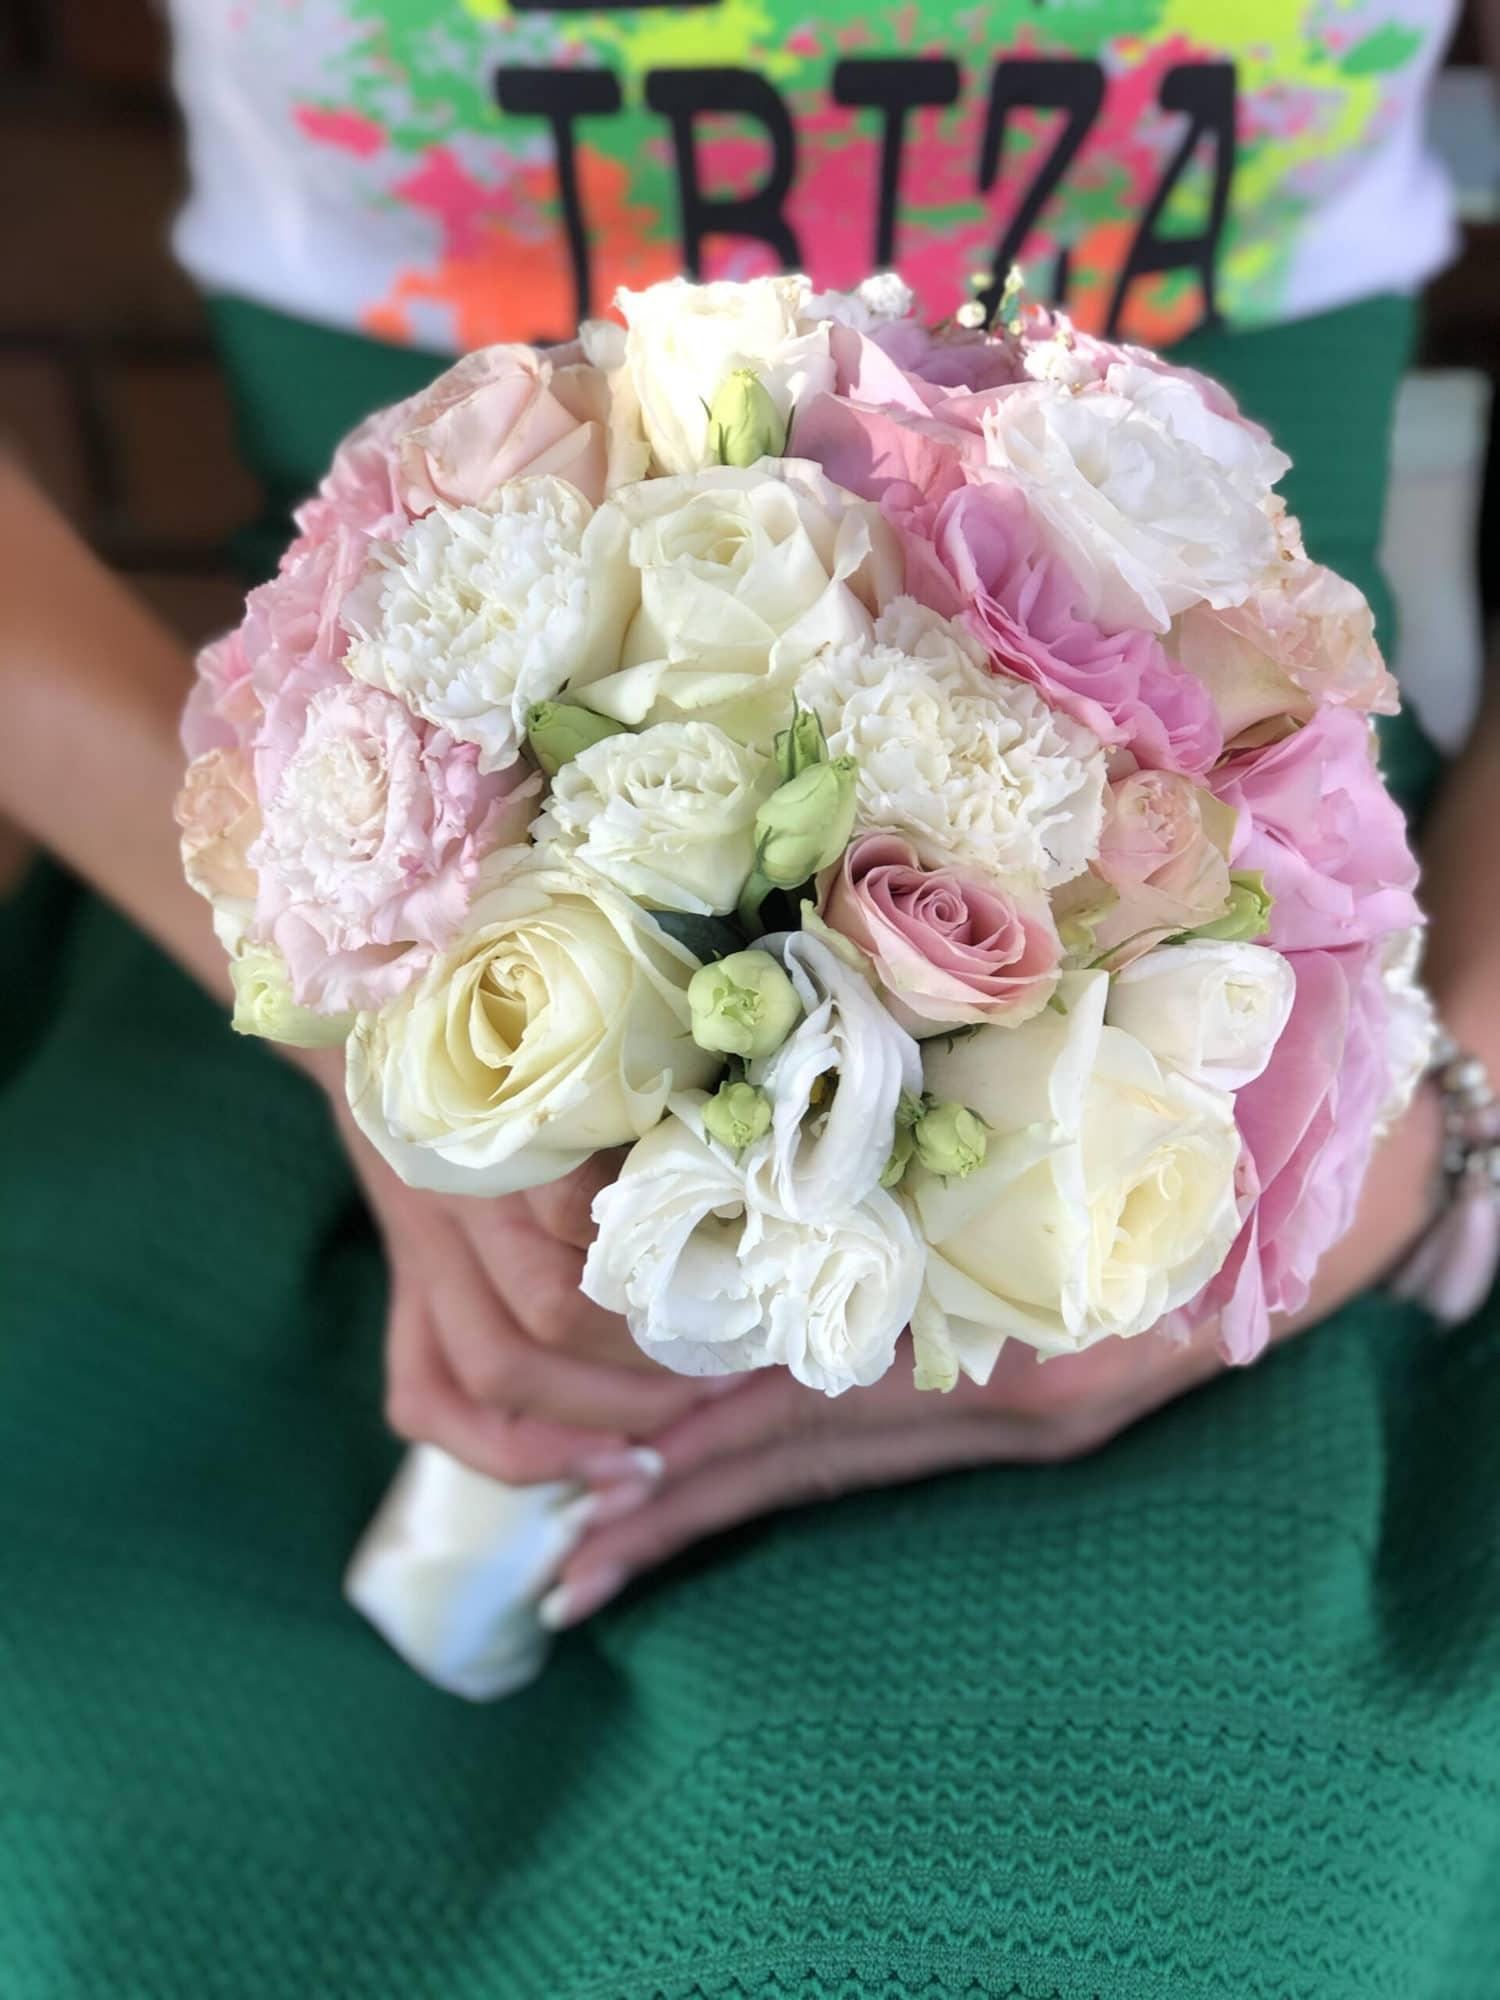 Bidermajer neznih pastelnih rozih boja, sa ubacenim belim ruzama